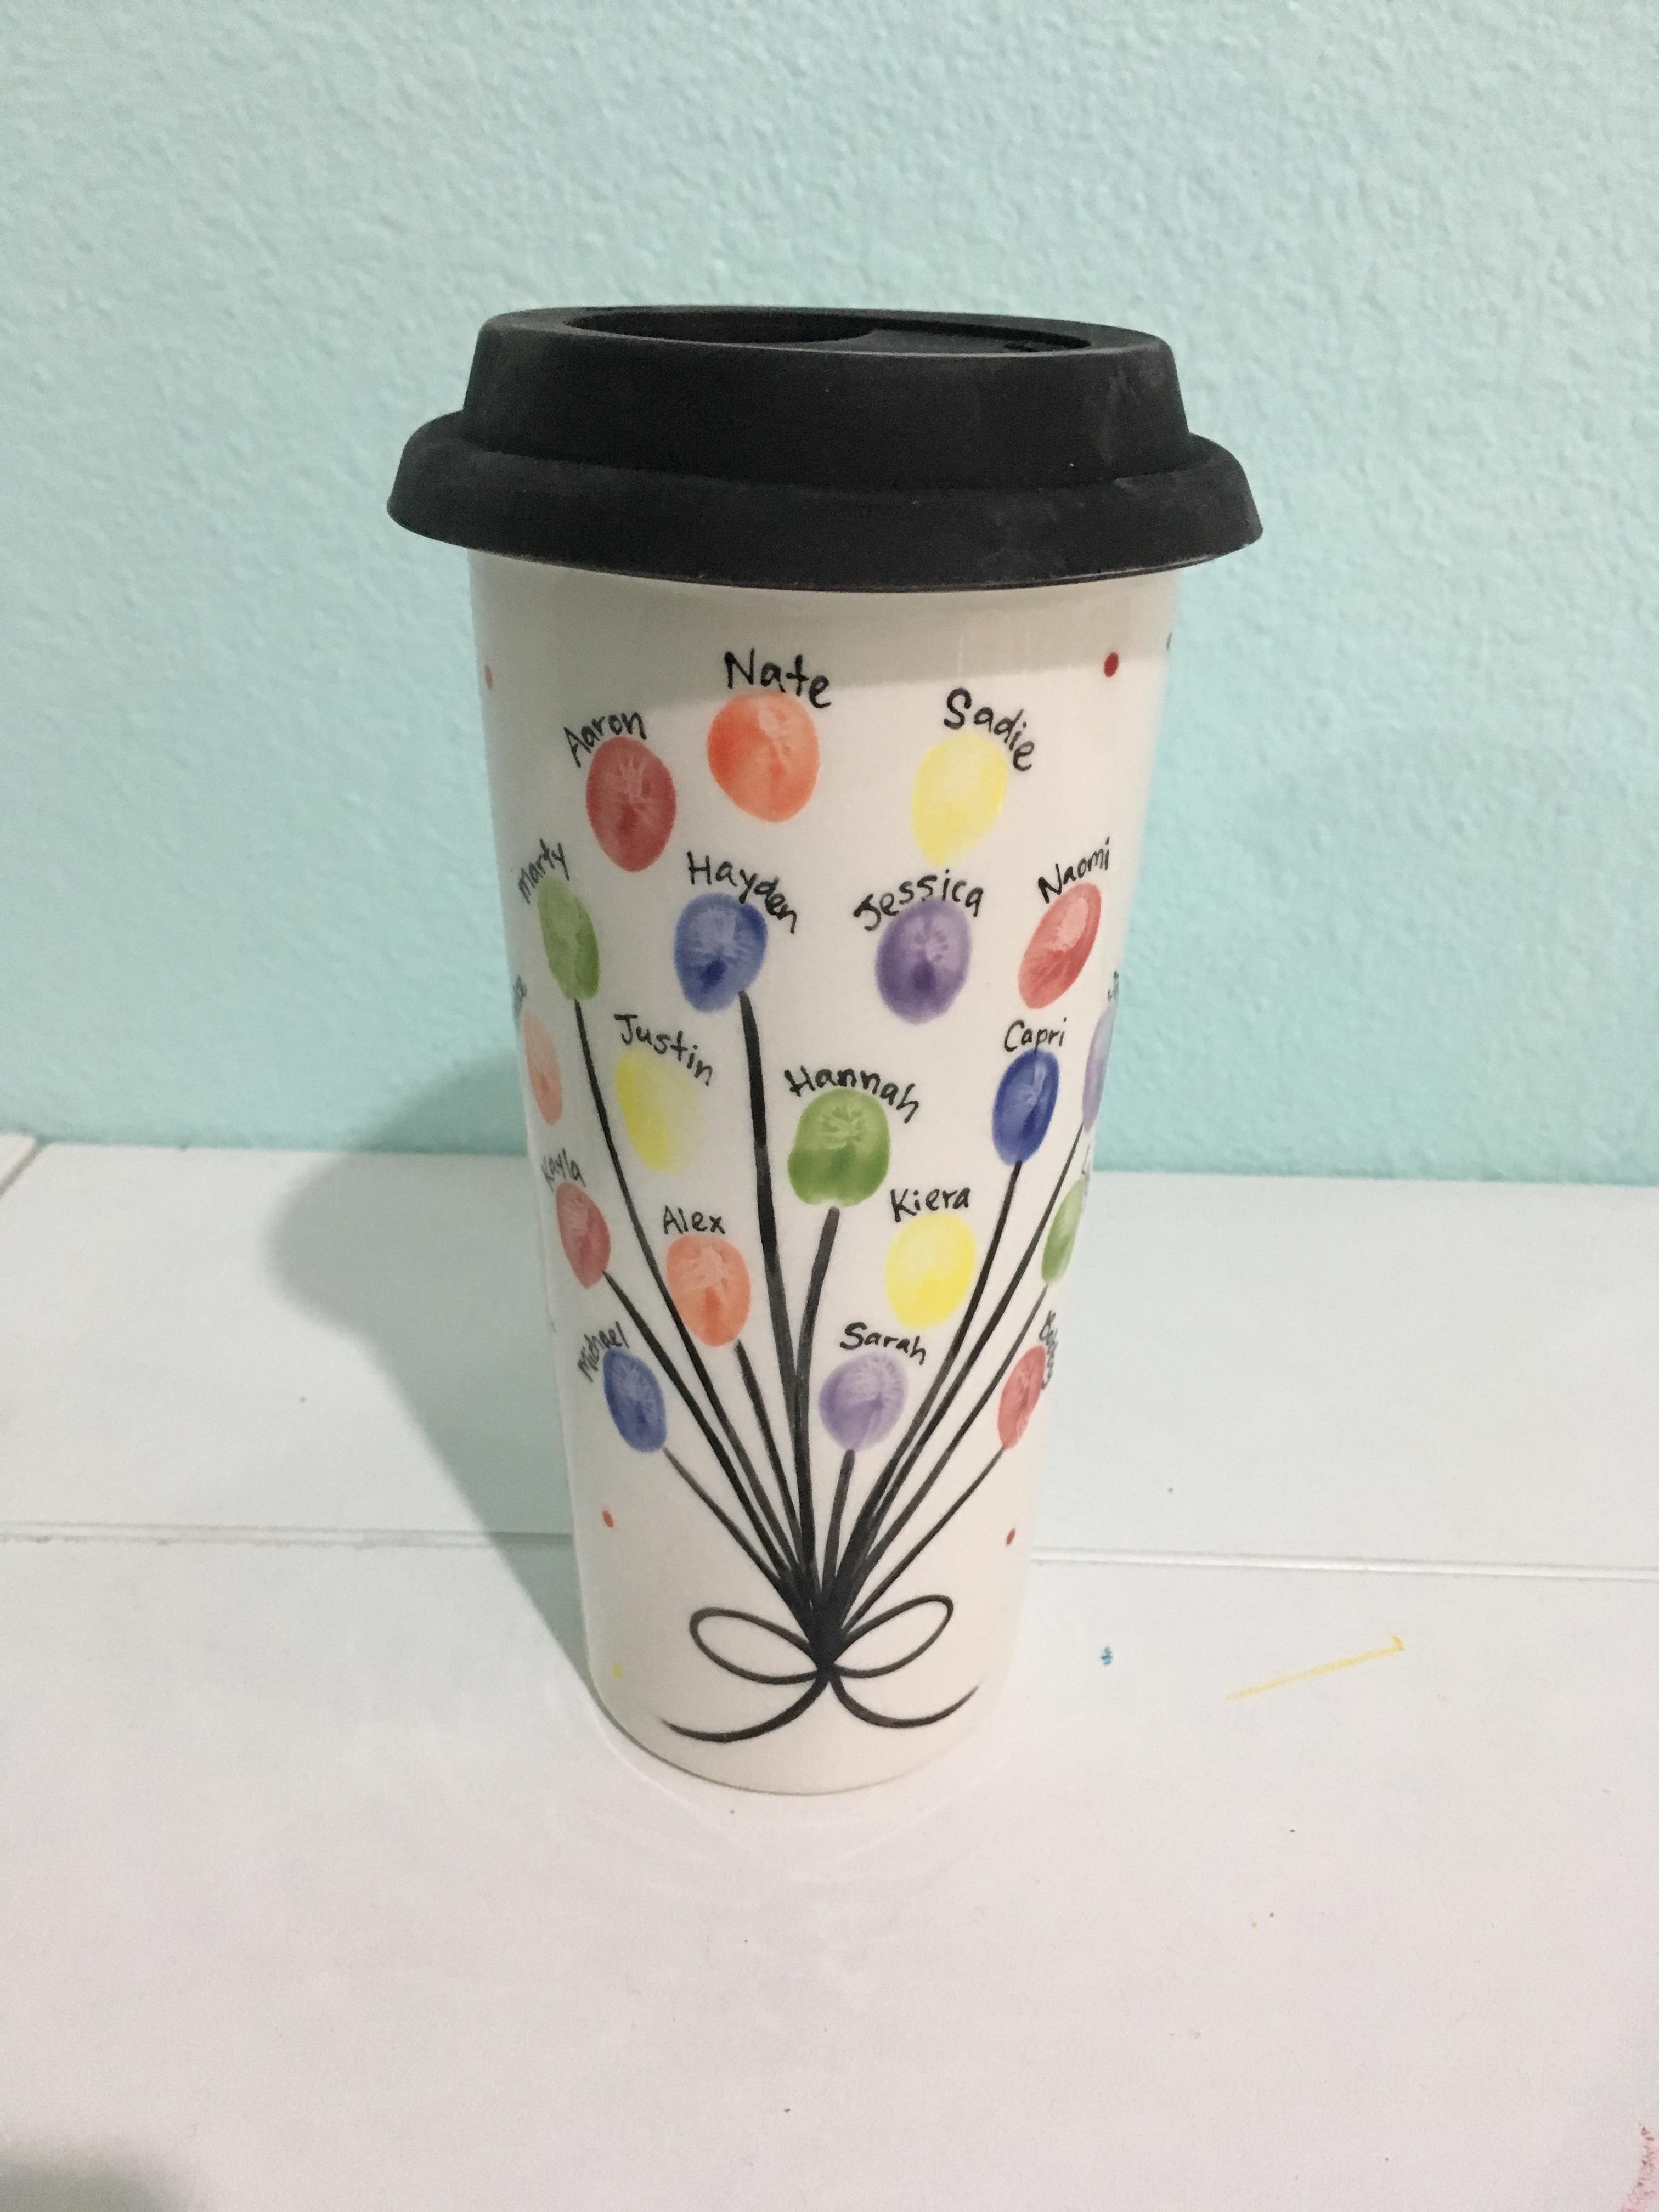 Practical coffee mug